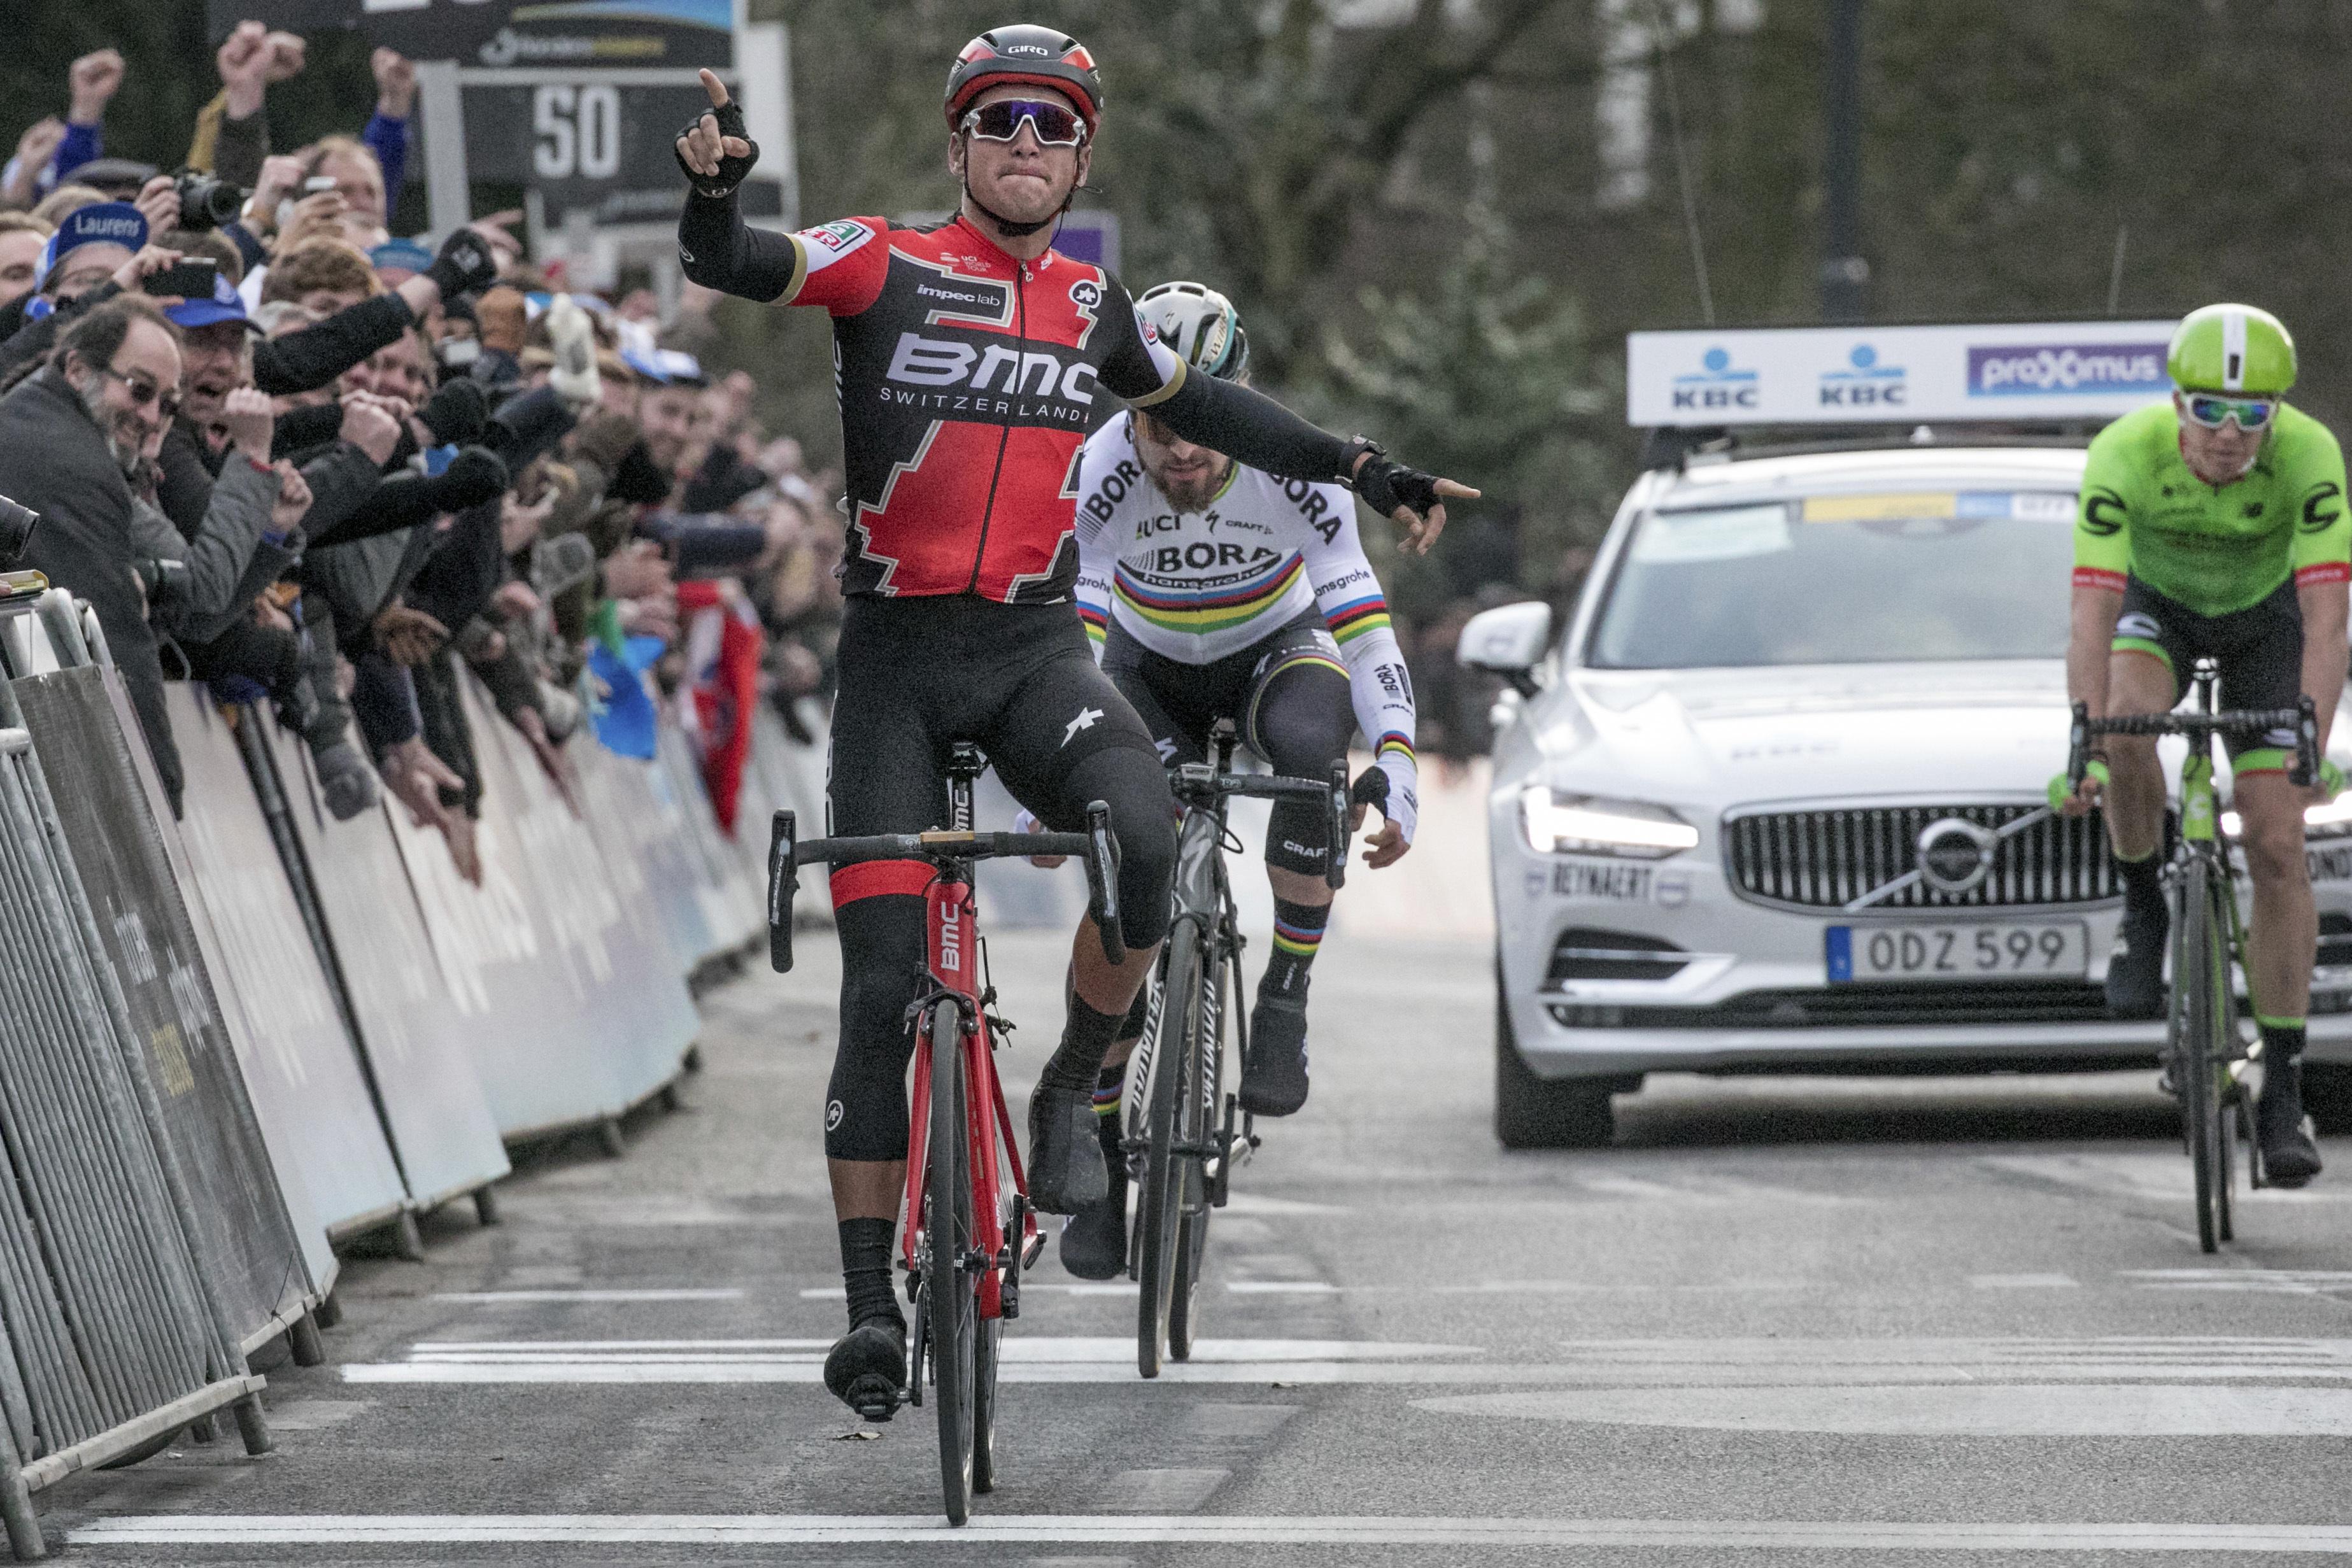 Belgian Greg Van Avermaet from BMC racing Team, front, celebrates as he wins the Belgian cycling classic Omloop Het Nieuwsblad in Ghent, Belgium, on Saturday, Feb. 25, 2017. Slovak Peter Sagan from Bora-Hansgrohe and Belgian Sep Vanmarcke from Cannondale-